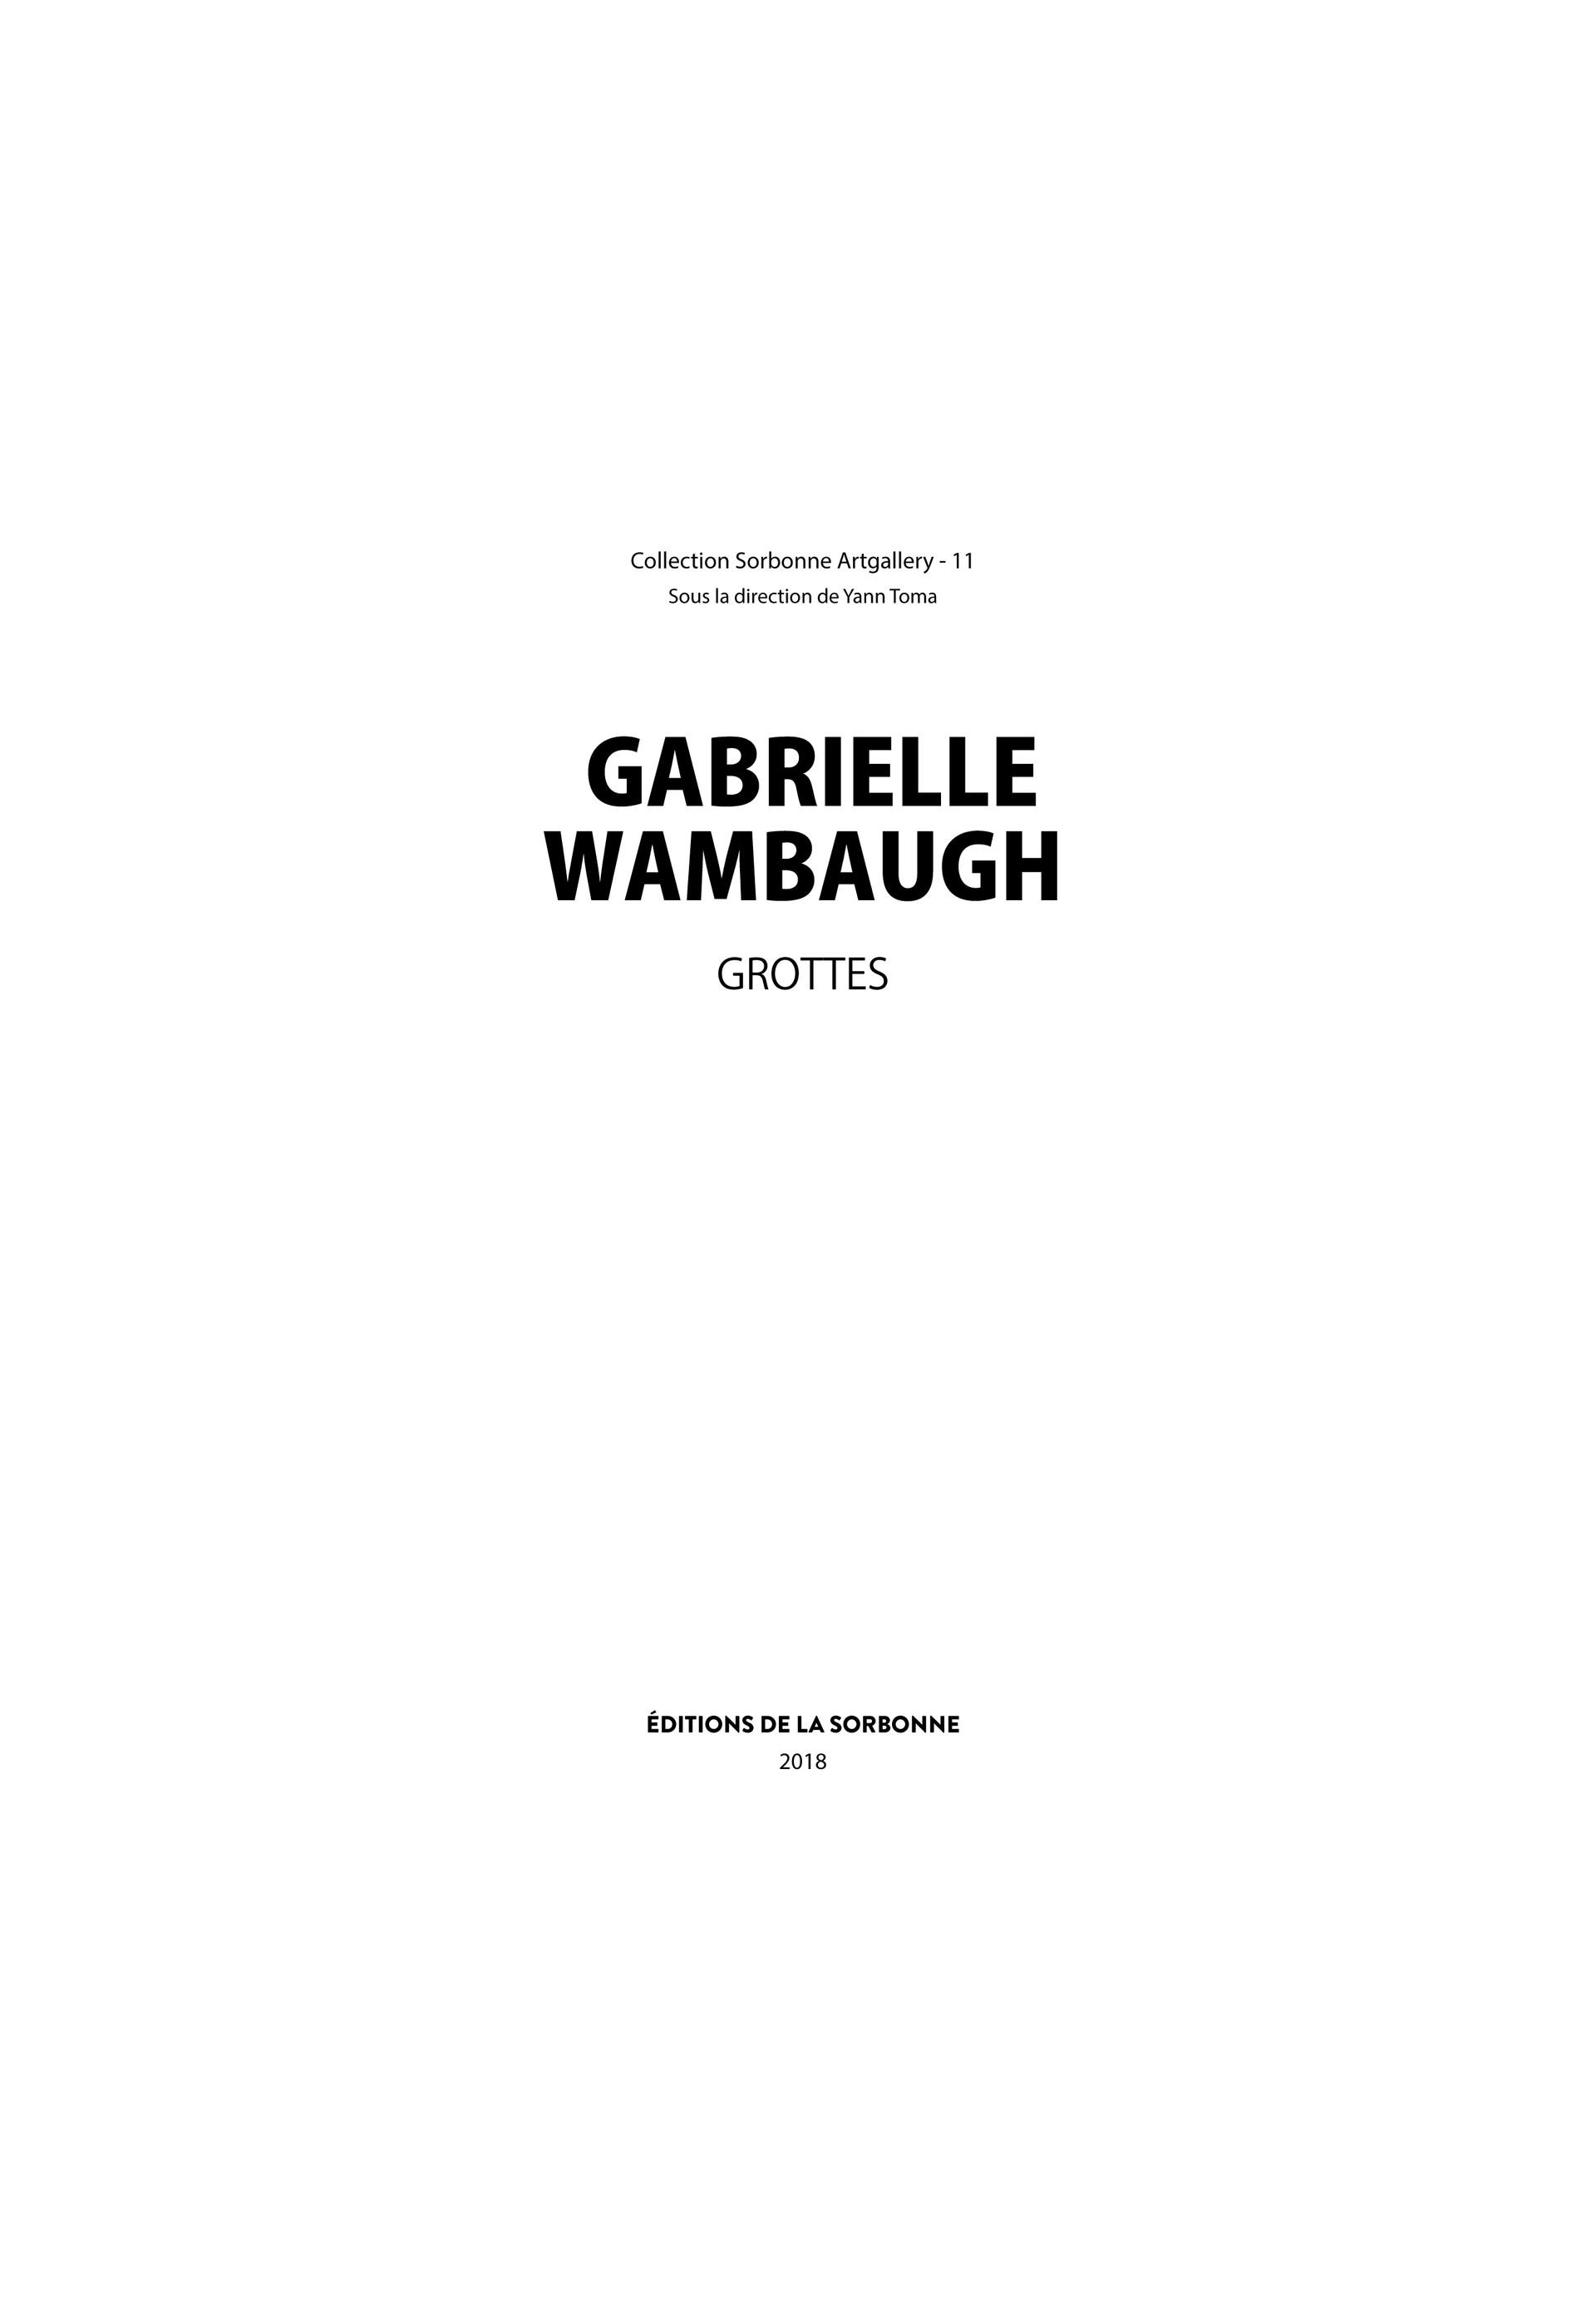 catalogue_Grottes_Sorbonne_frontpage.jpg